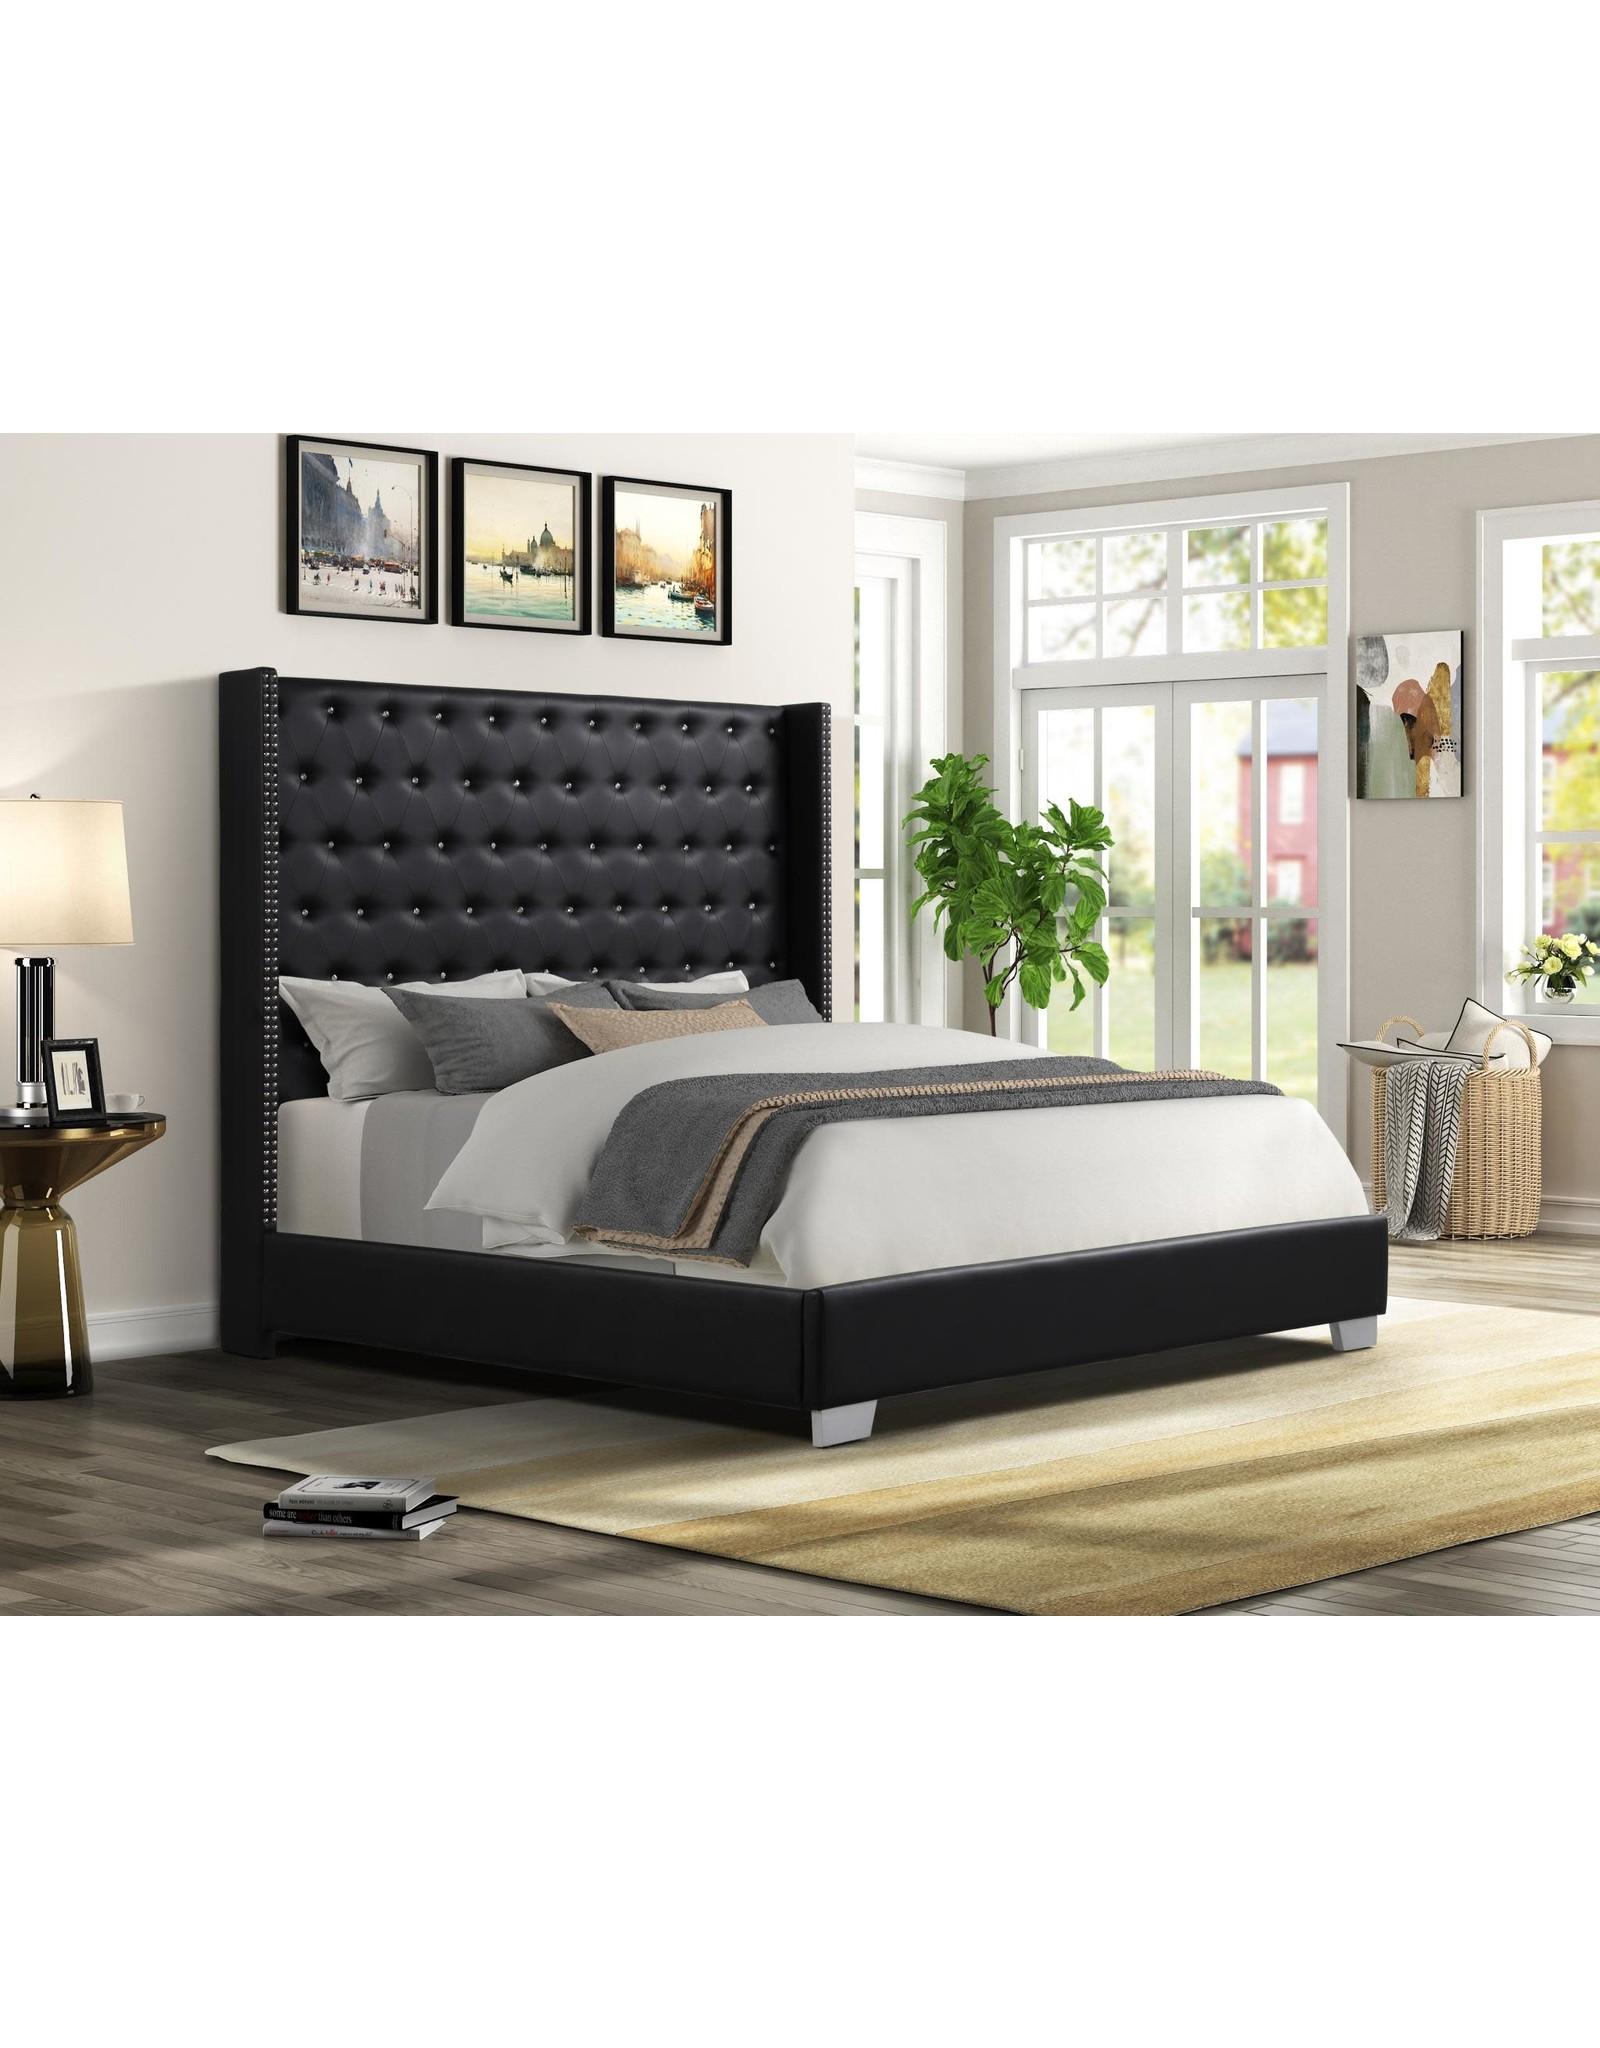 Alanis AL8027 Queen Bed Black